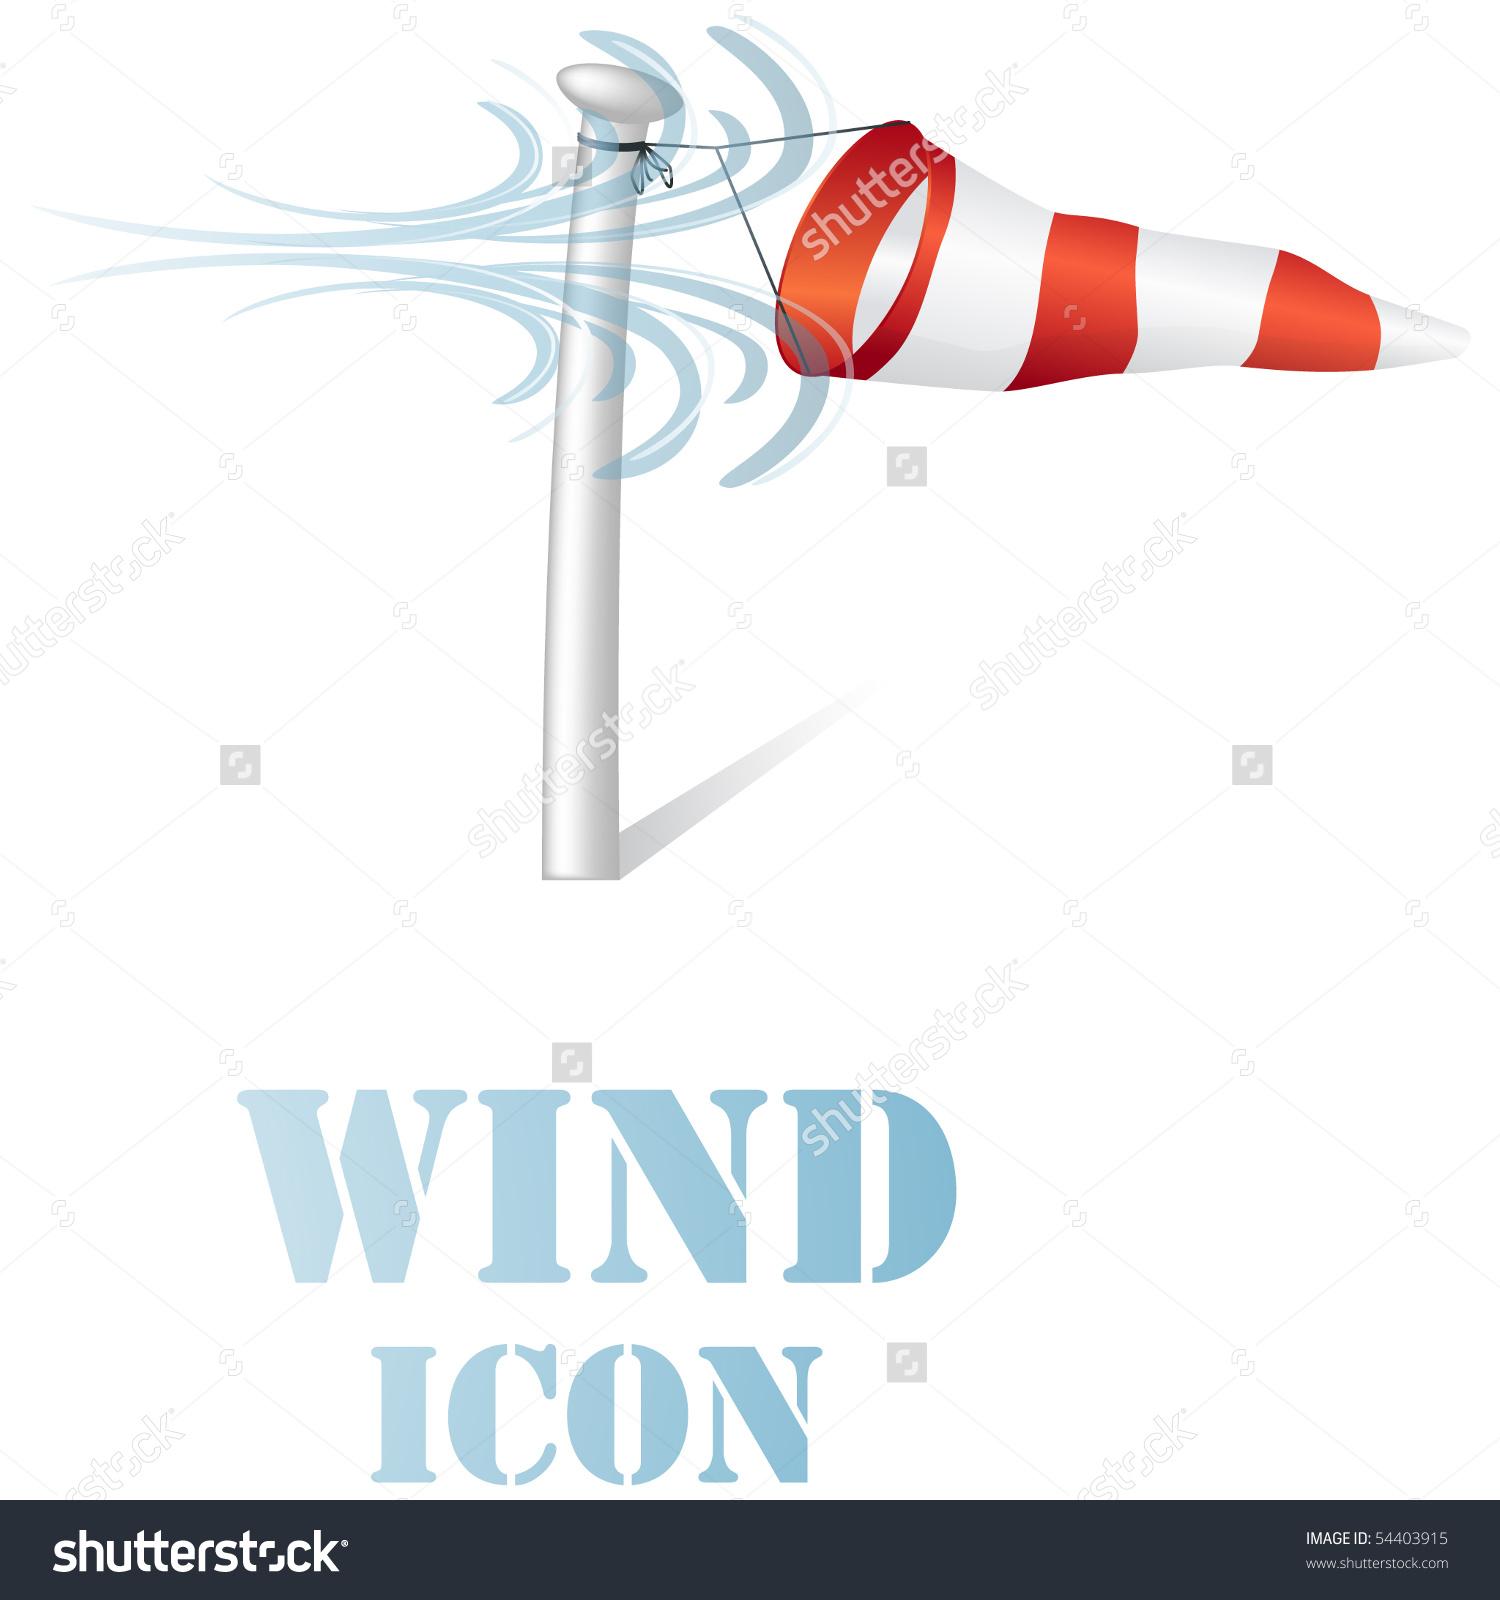 Wind speed clipart jpg stock Wind Speed Flag On Pole Icon Stock Vector 54403915 - Shutterstock jpg stock